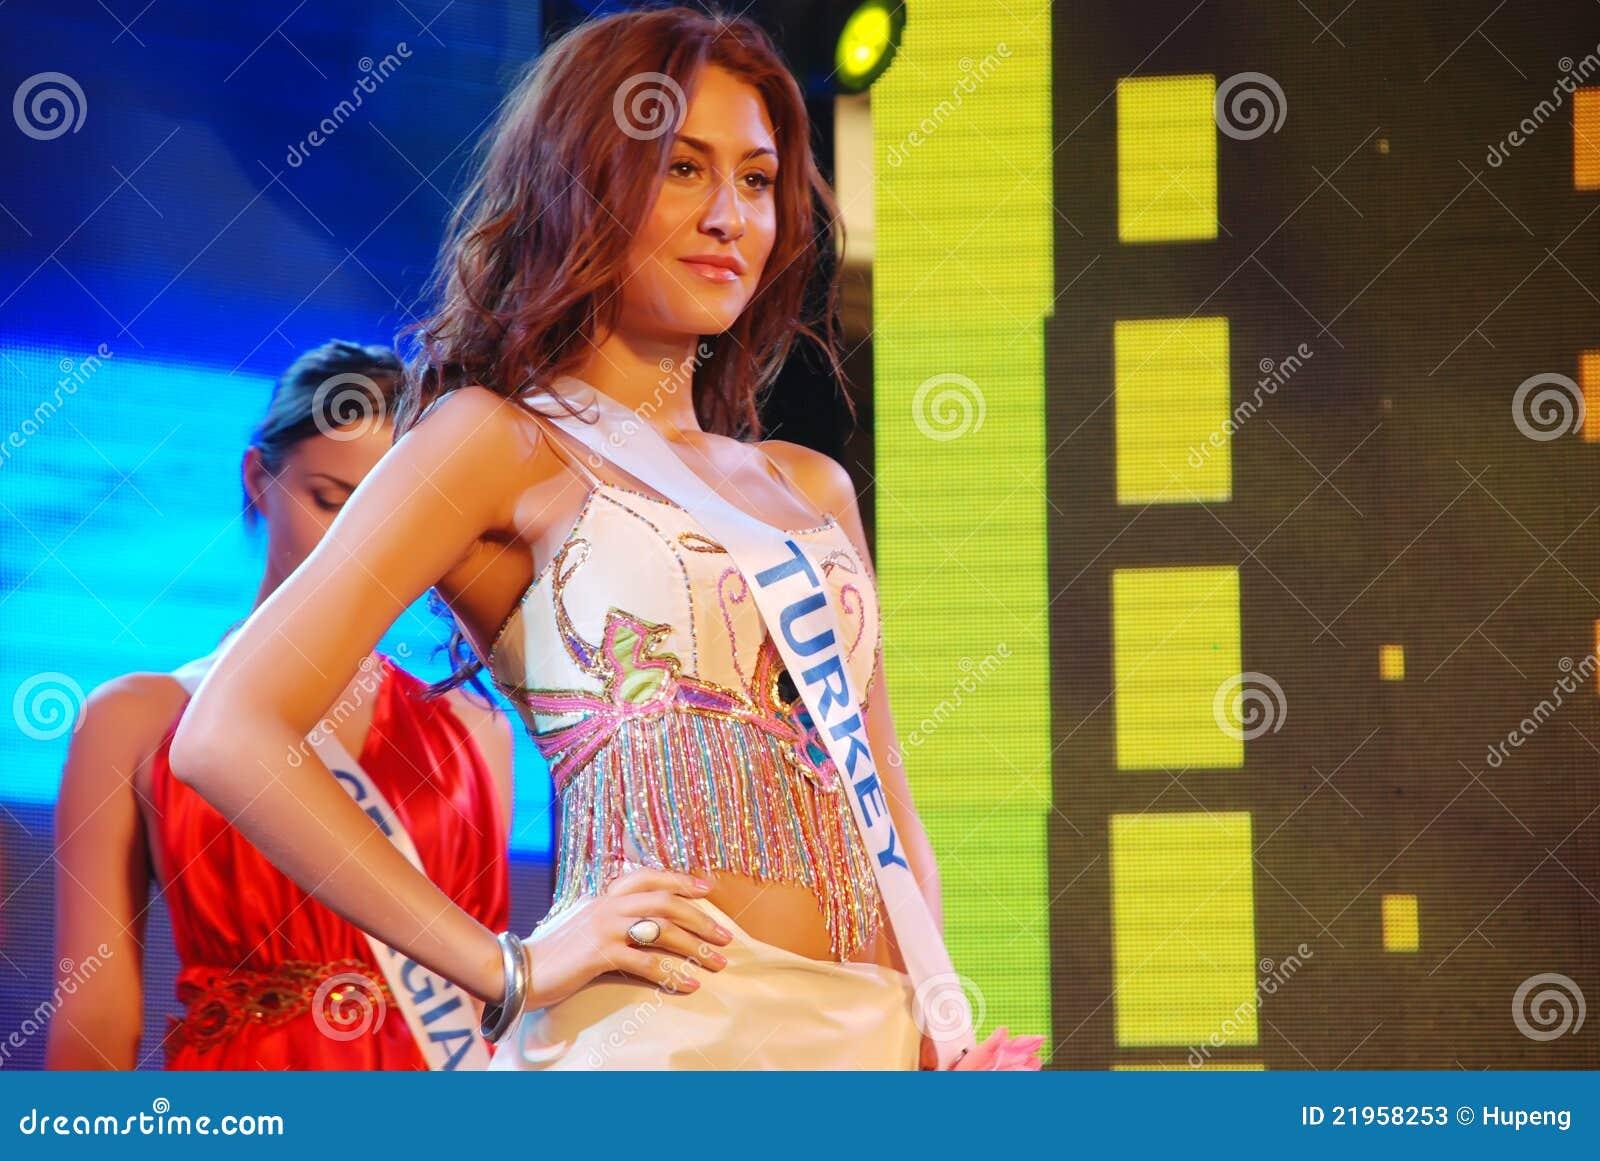 Miss turkey wearing National costume. Miss turkey Stock Photos  sc 1 st  Dreamstime.com & Turkey National Costume Stock Photos - Royalty Free Images